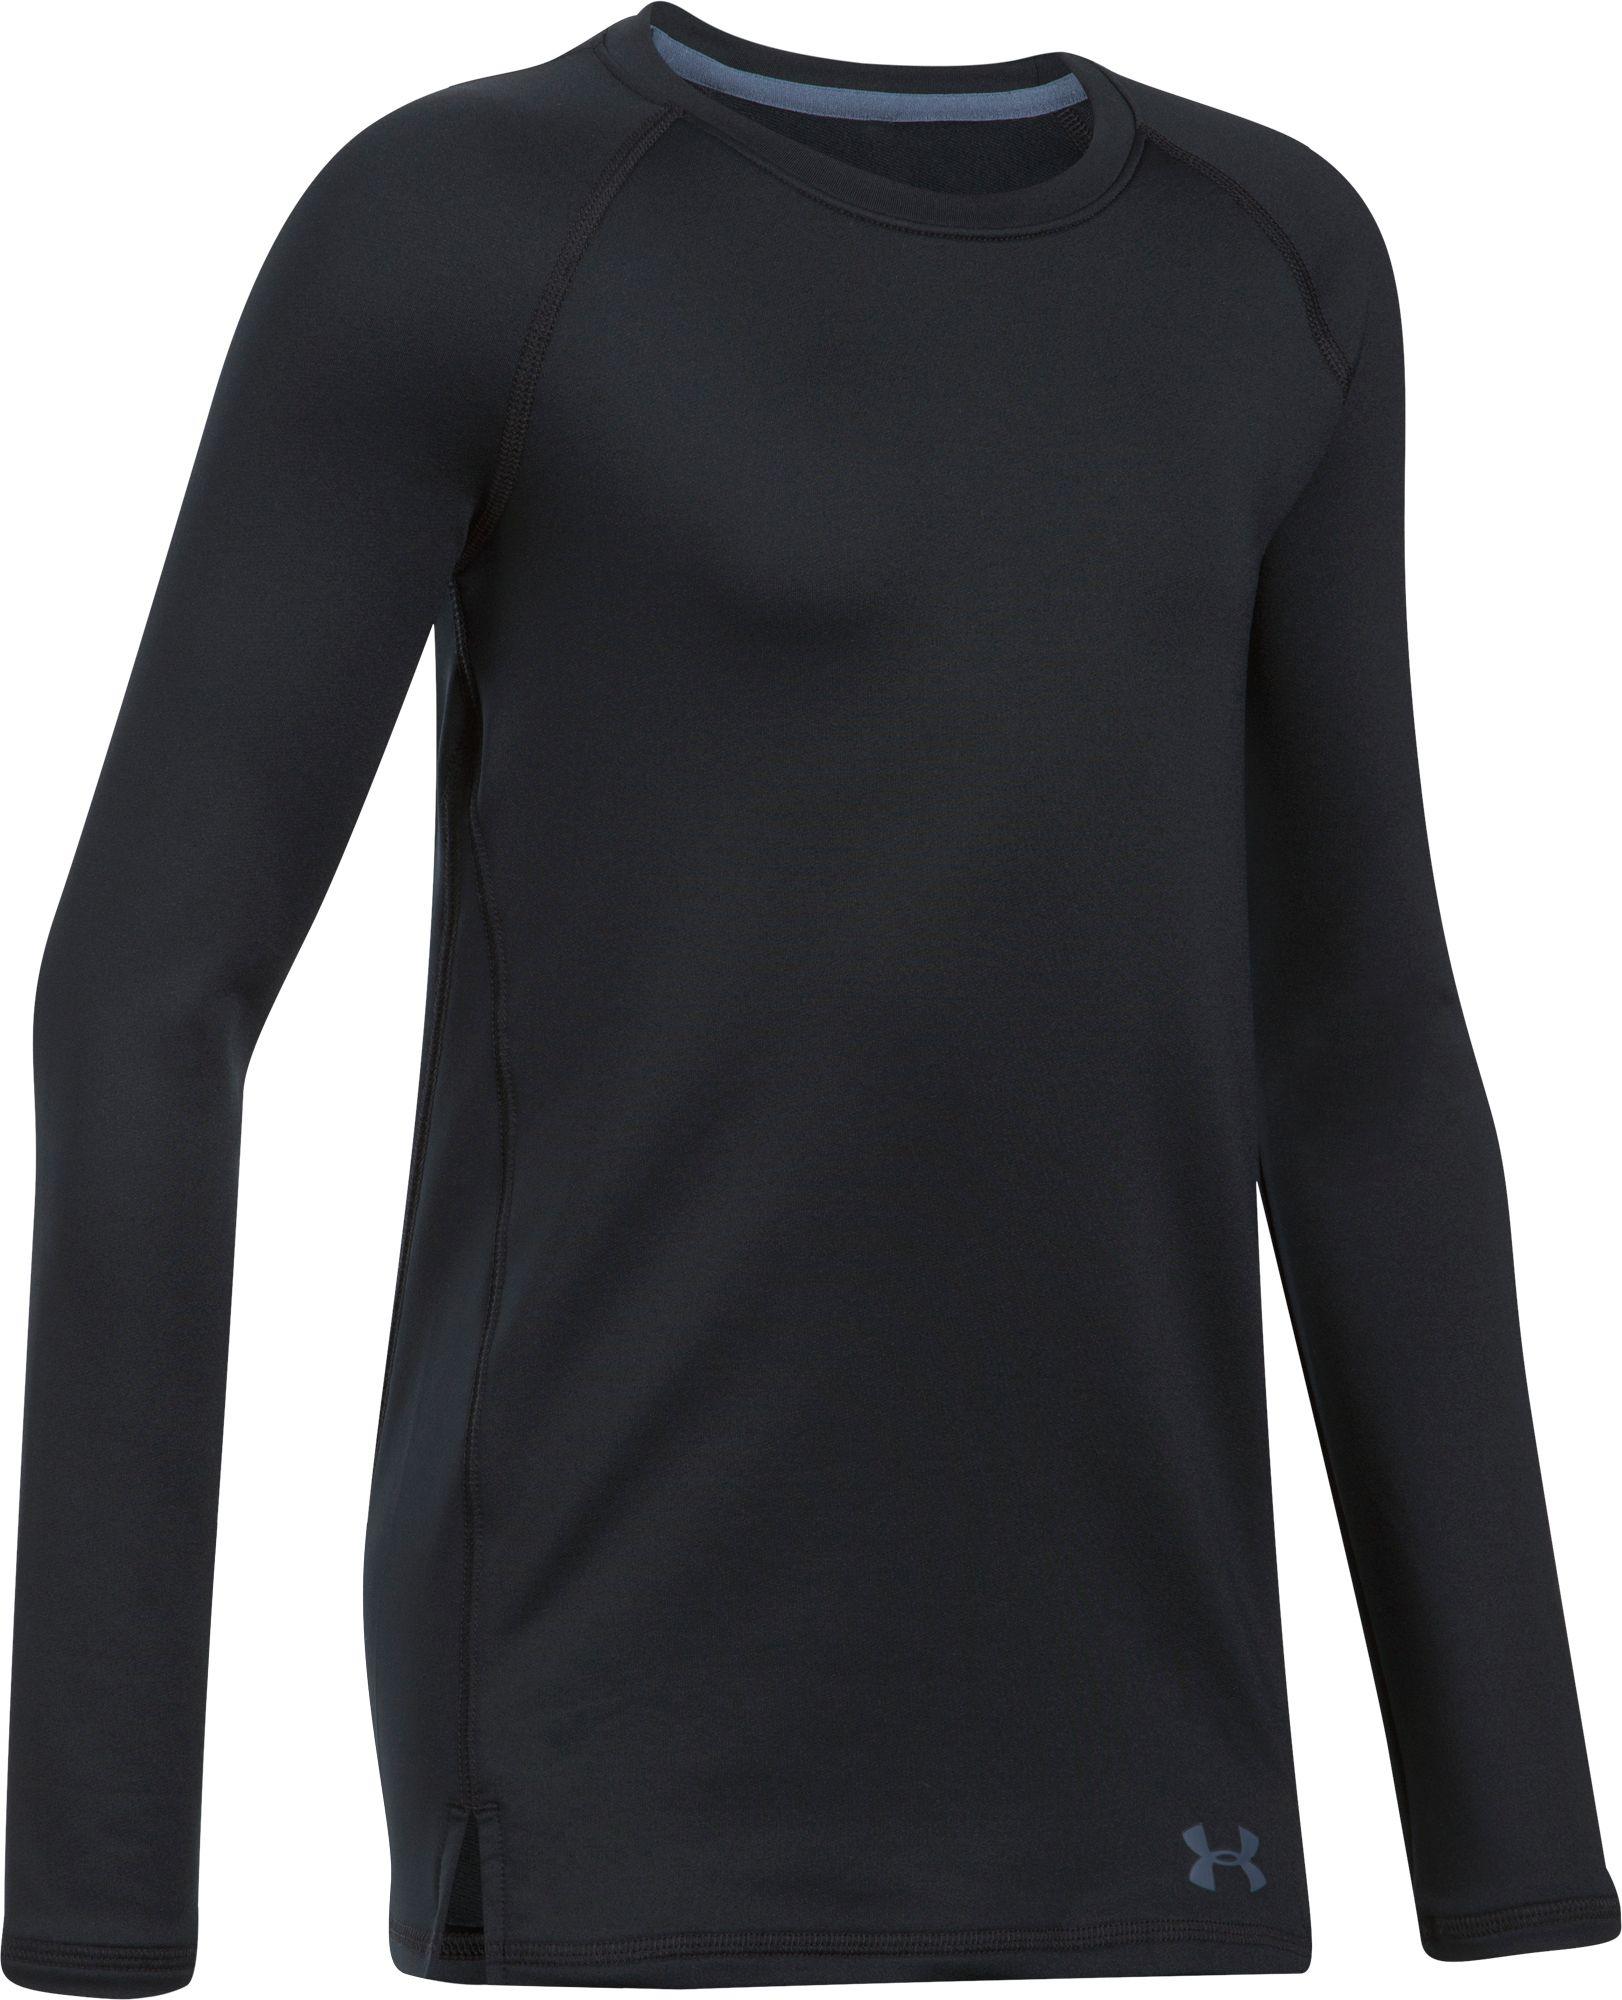 Under Armour Girls' ColdGear Crew Shirt, Girl's, Size: XS, Black thumbnail